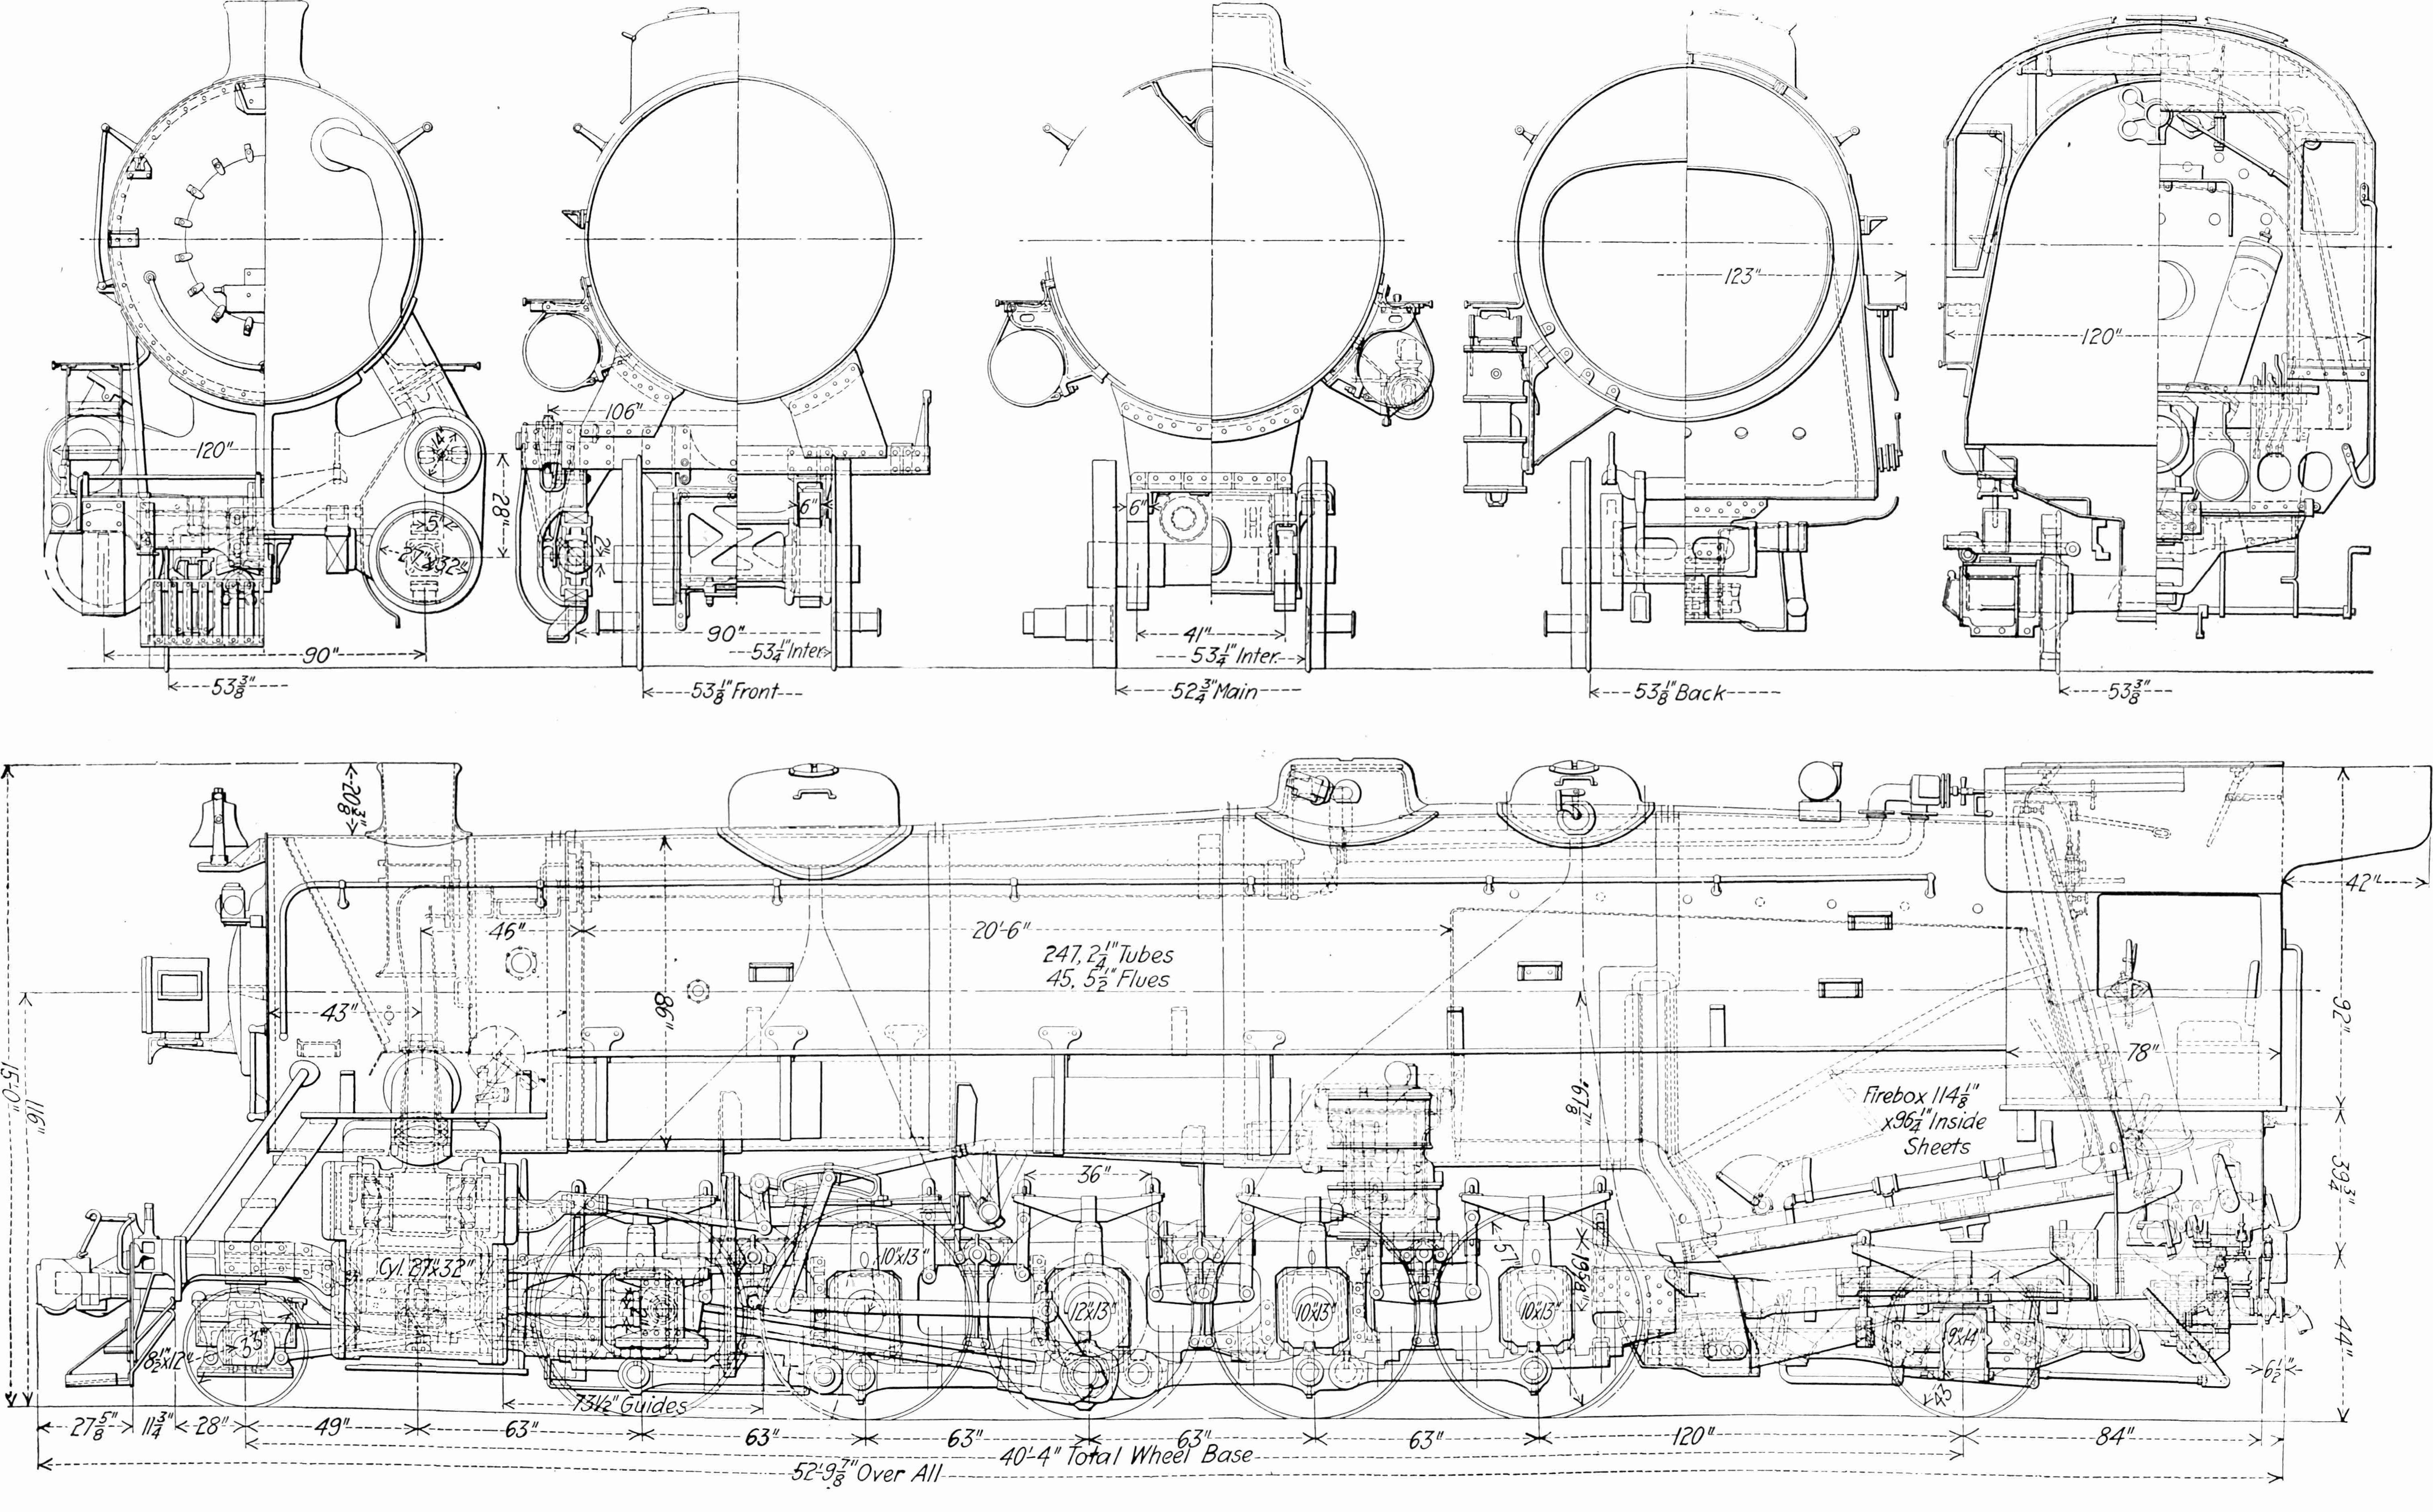 Pin By Marissa Monteiro On Blueprints Train Live Steam